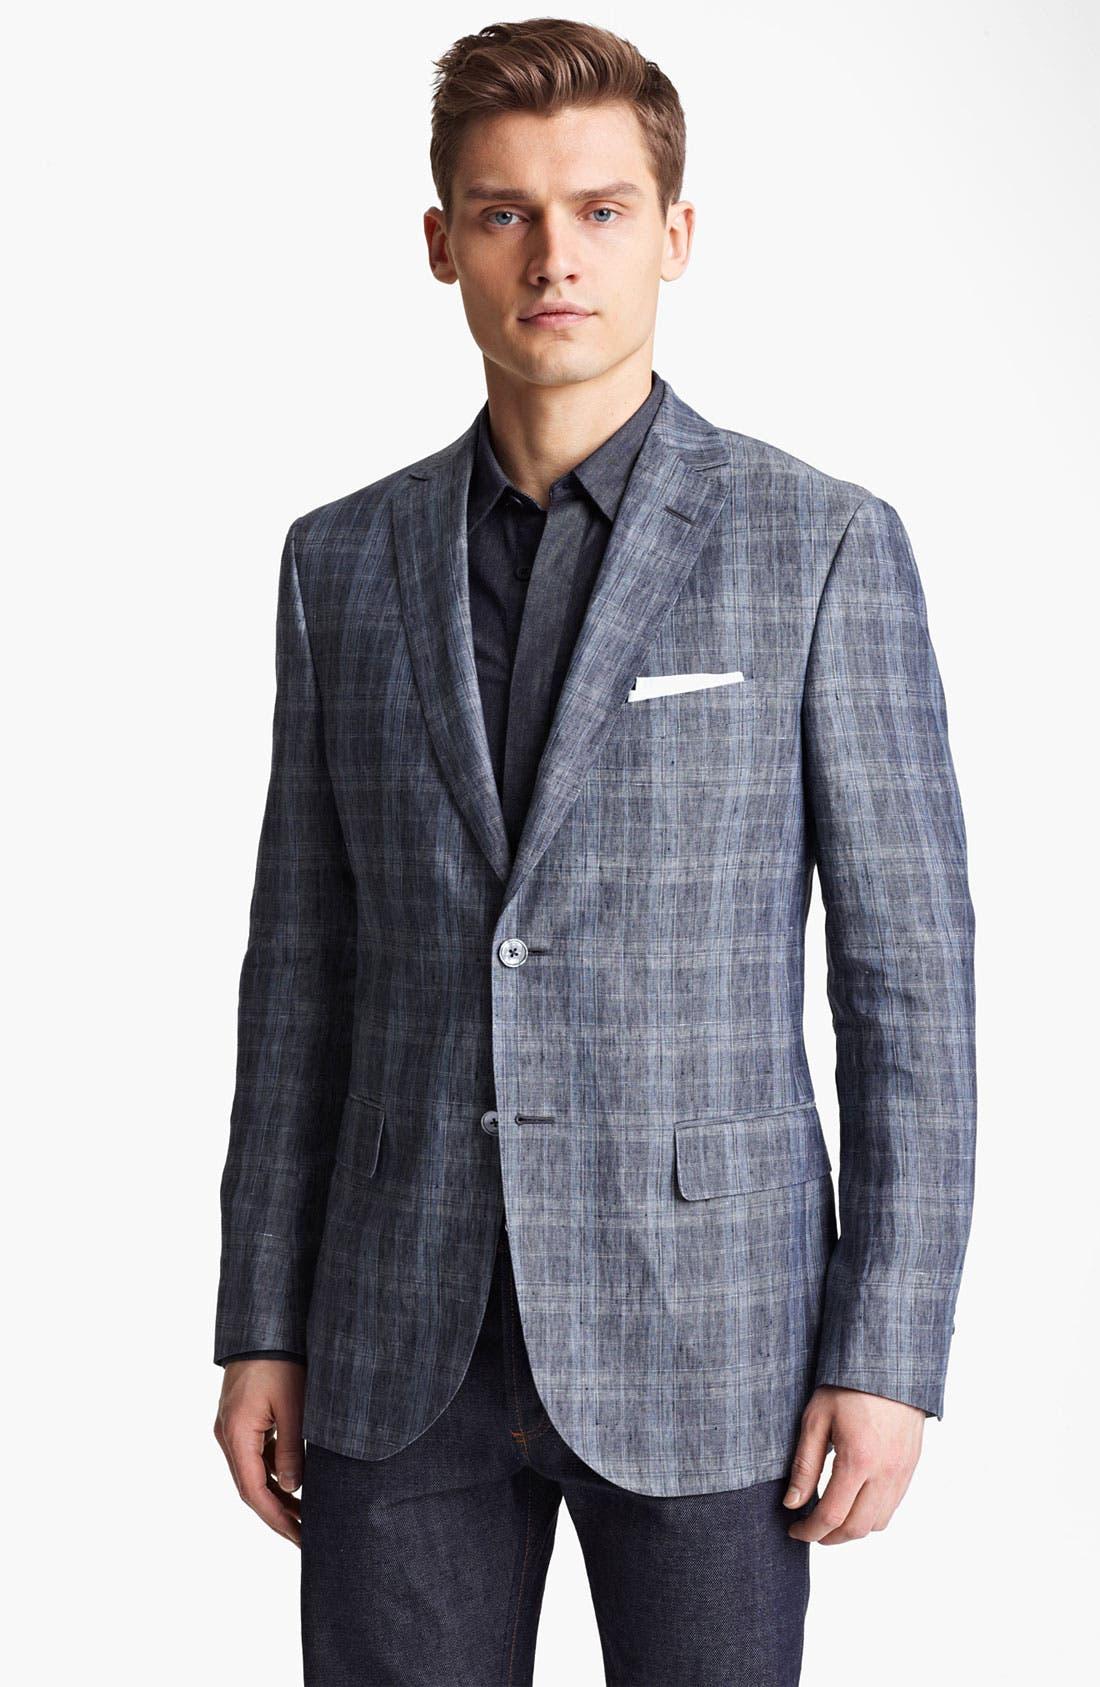 Alternate Image 1 Selected - Z Zegna Trim Fit Linen Sportcoat